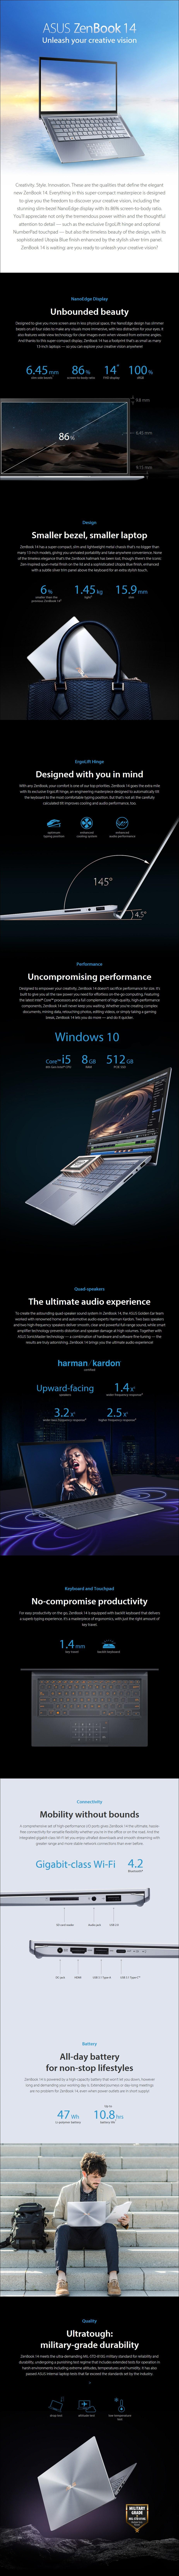 "ASUS ZenBook 14 UX431FA 14"" Laptop i5-8265U 8GB 512GB W10P - Utopia Blue Metal - Overview 1"